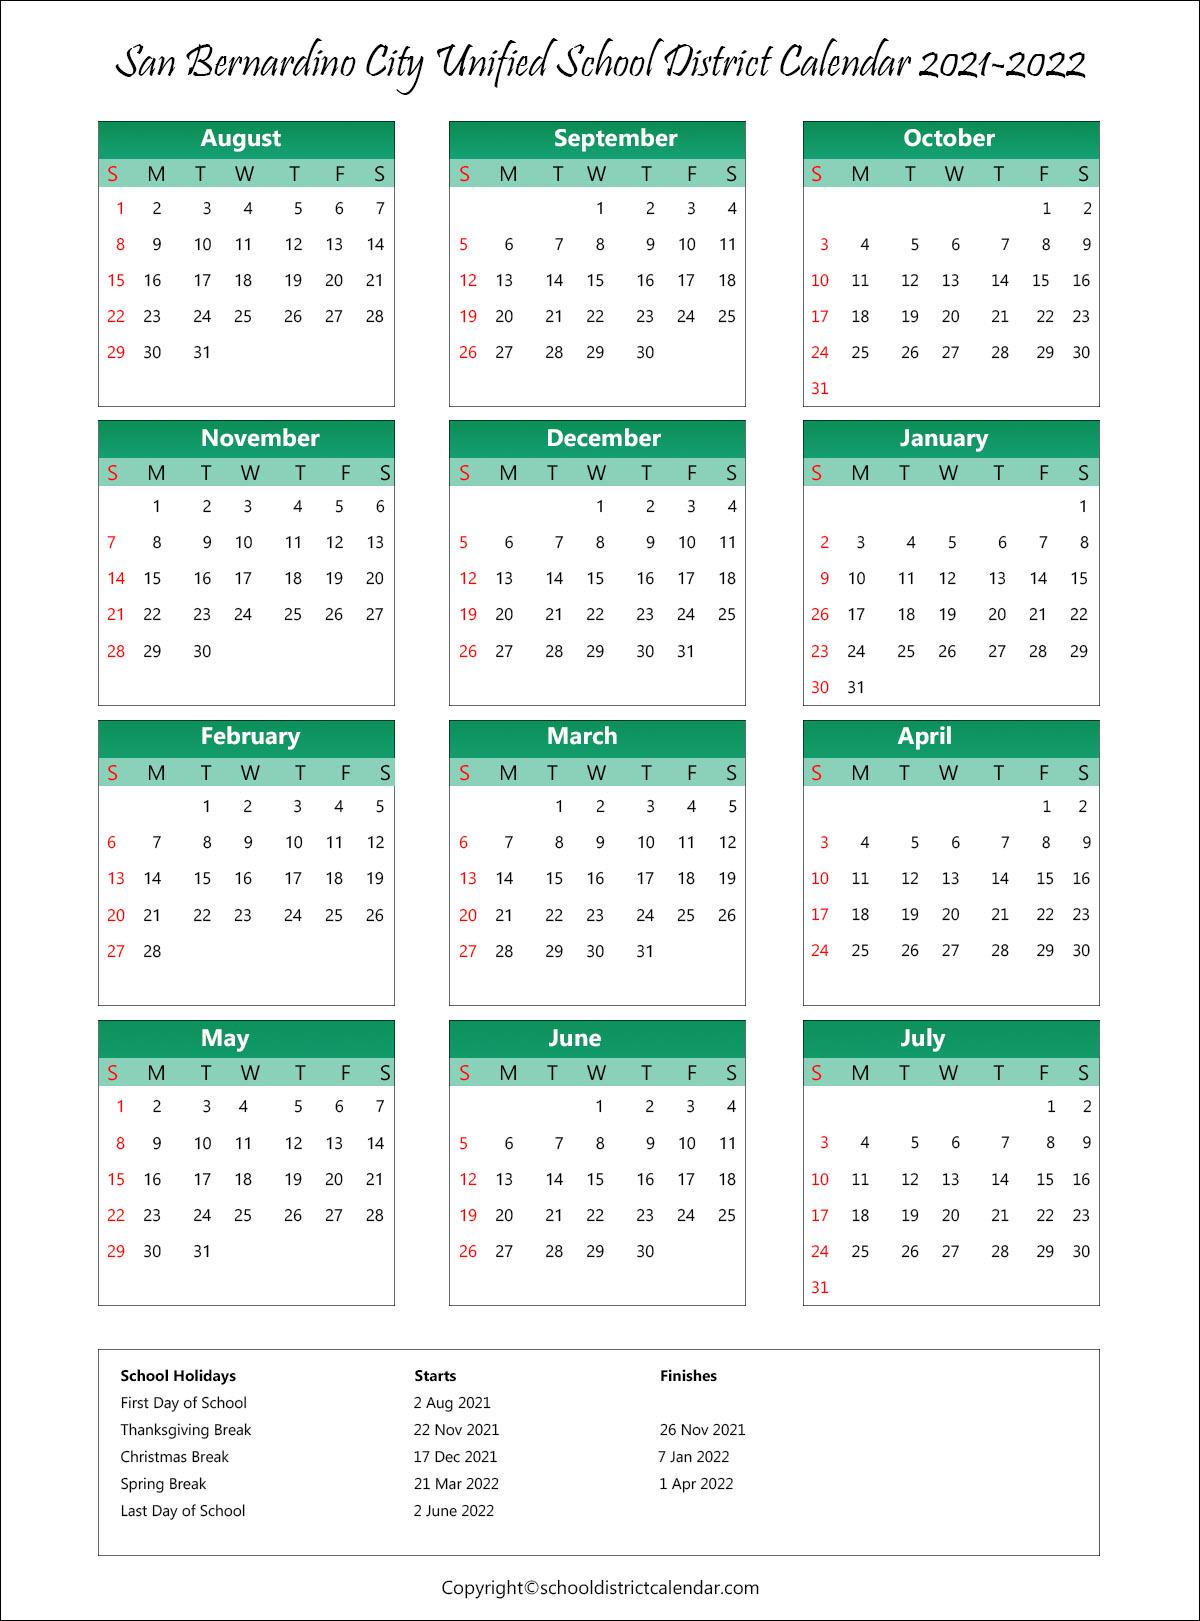 San Bernardino City Unified School District, California Calendar Holidays 2021